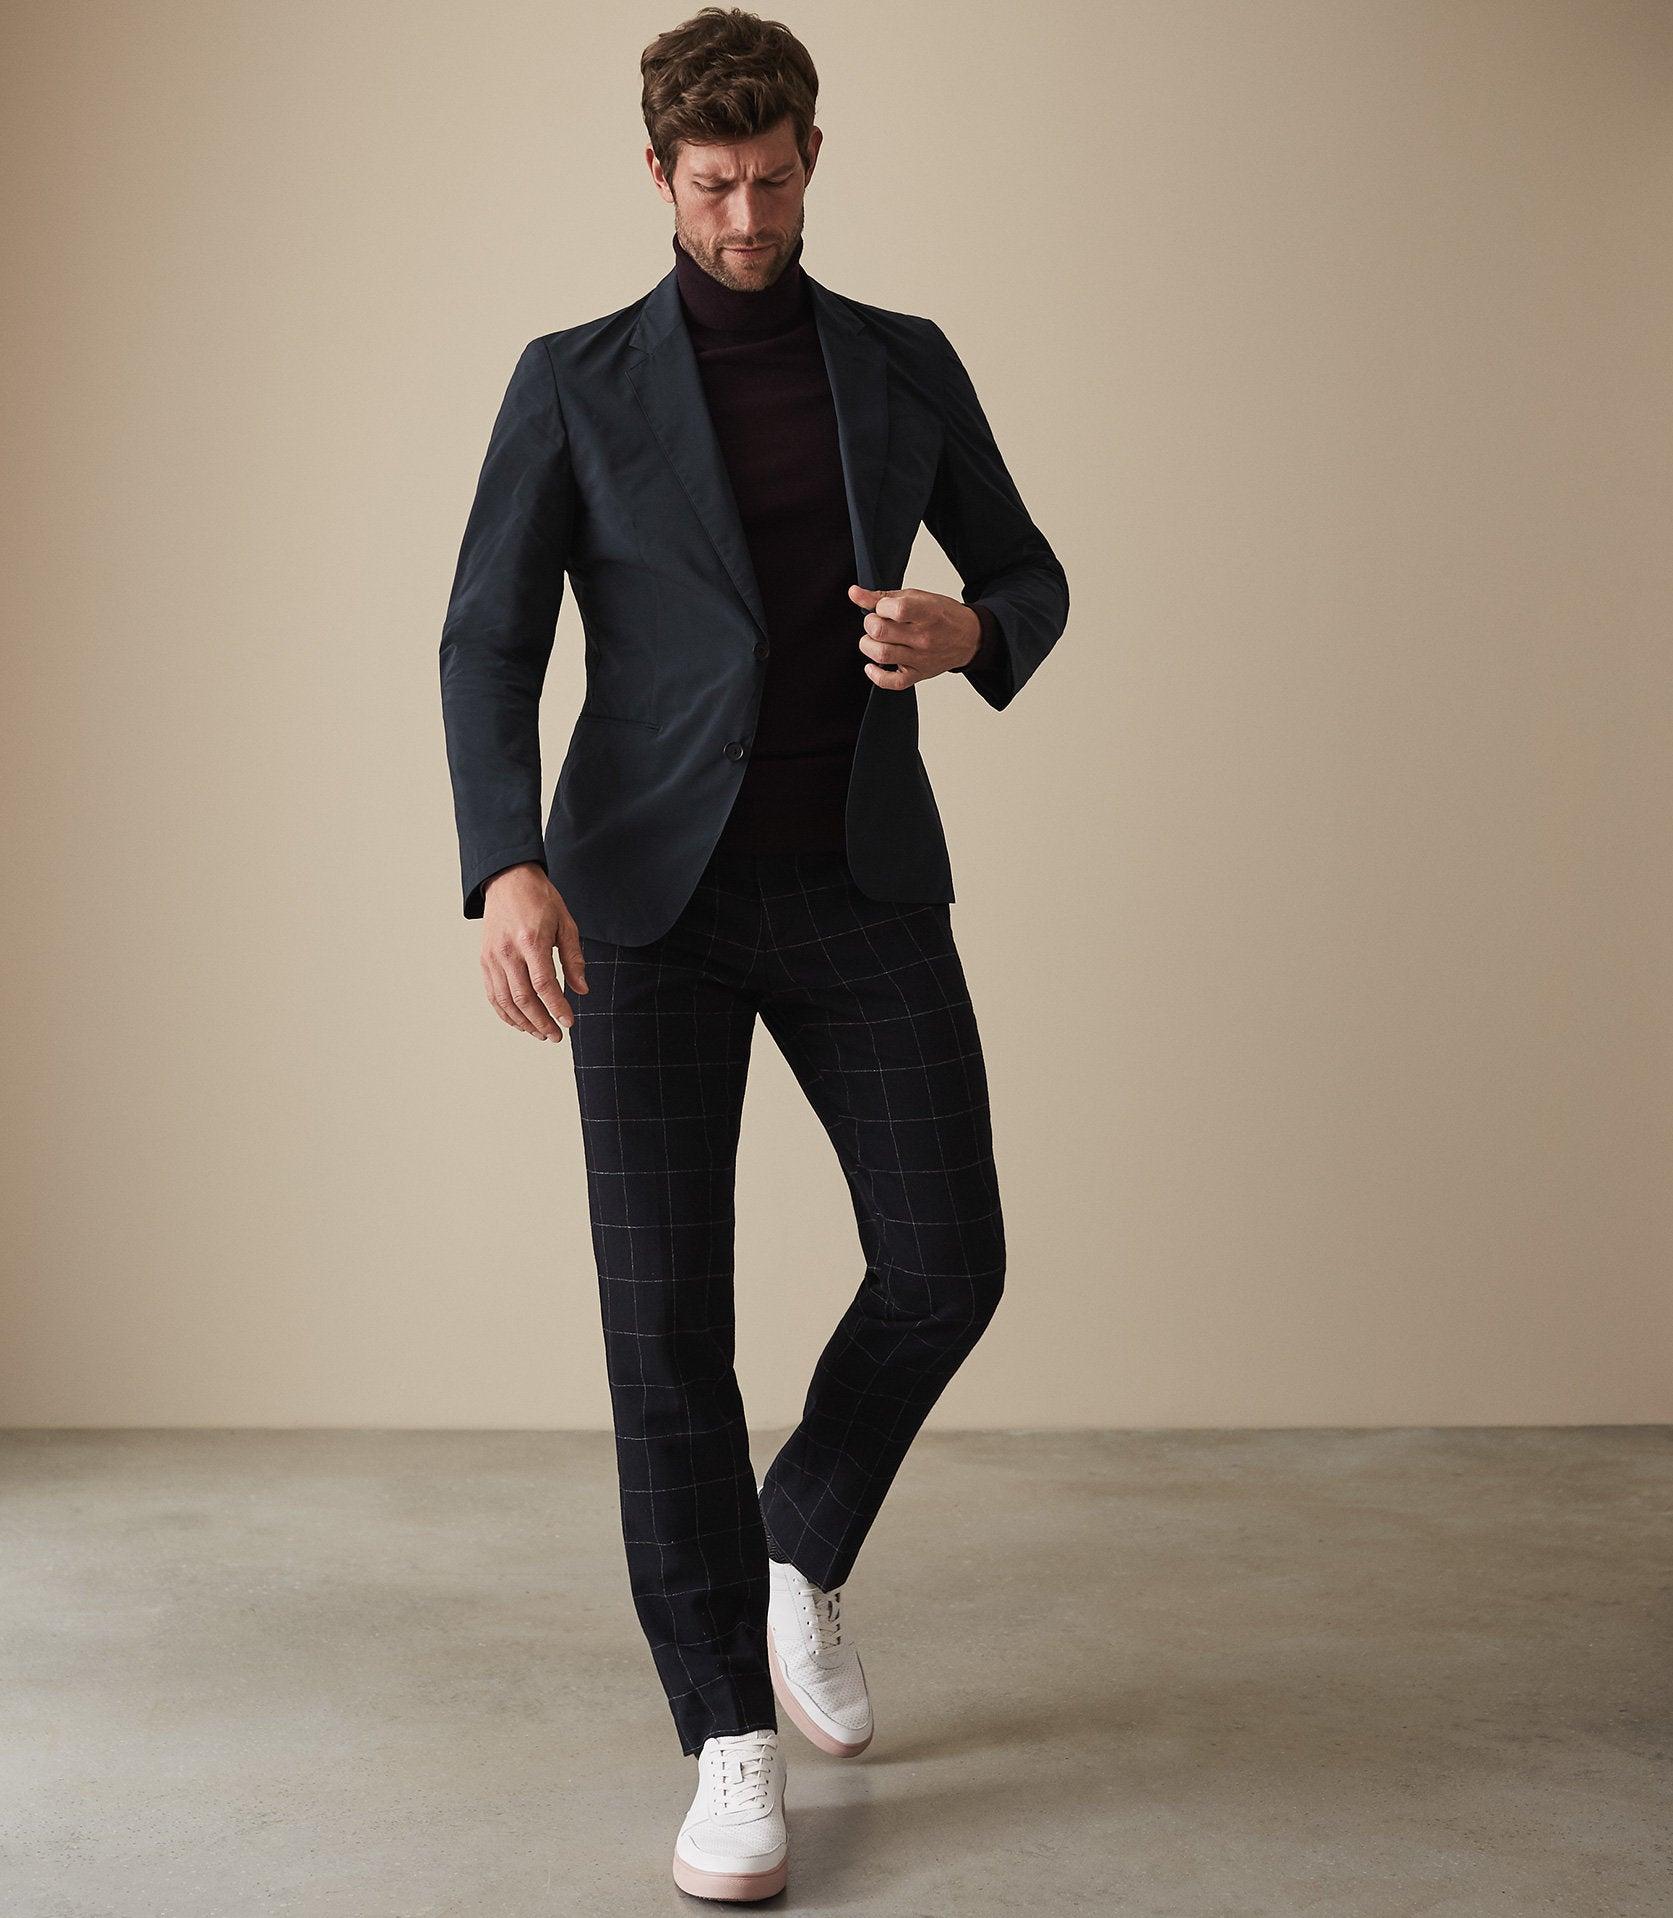 Men wearing black blazer and checkered black pants